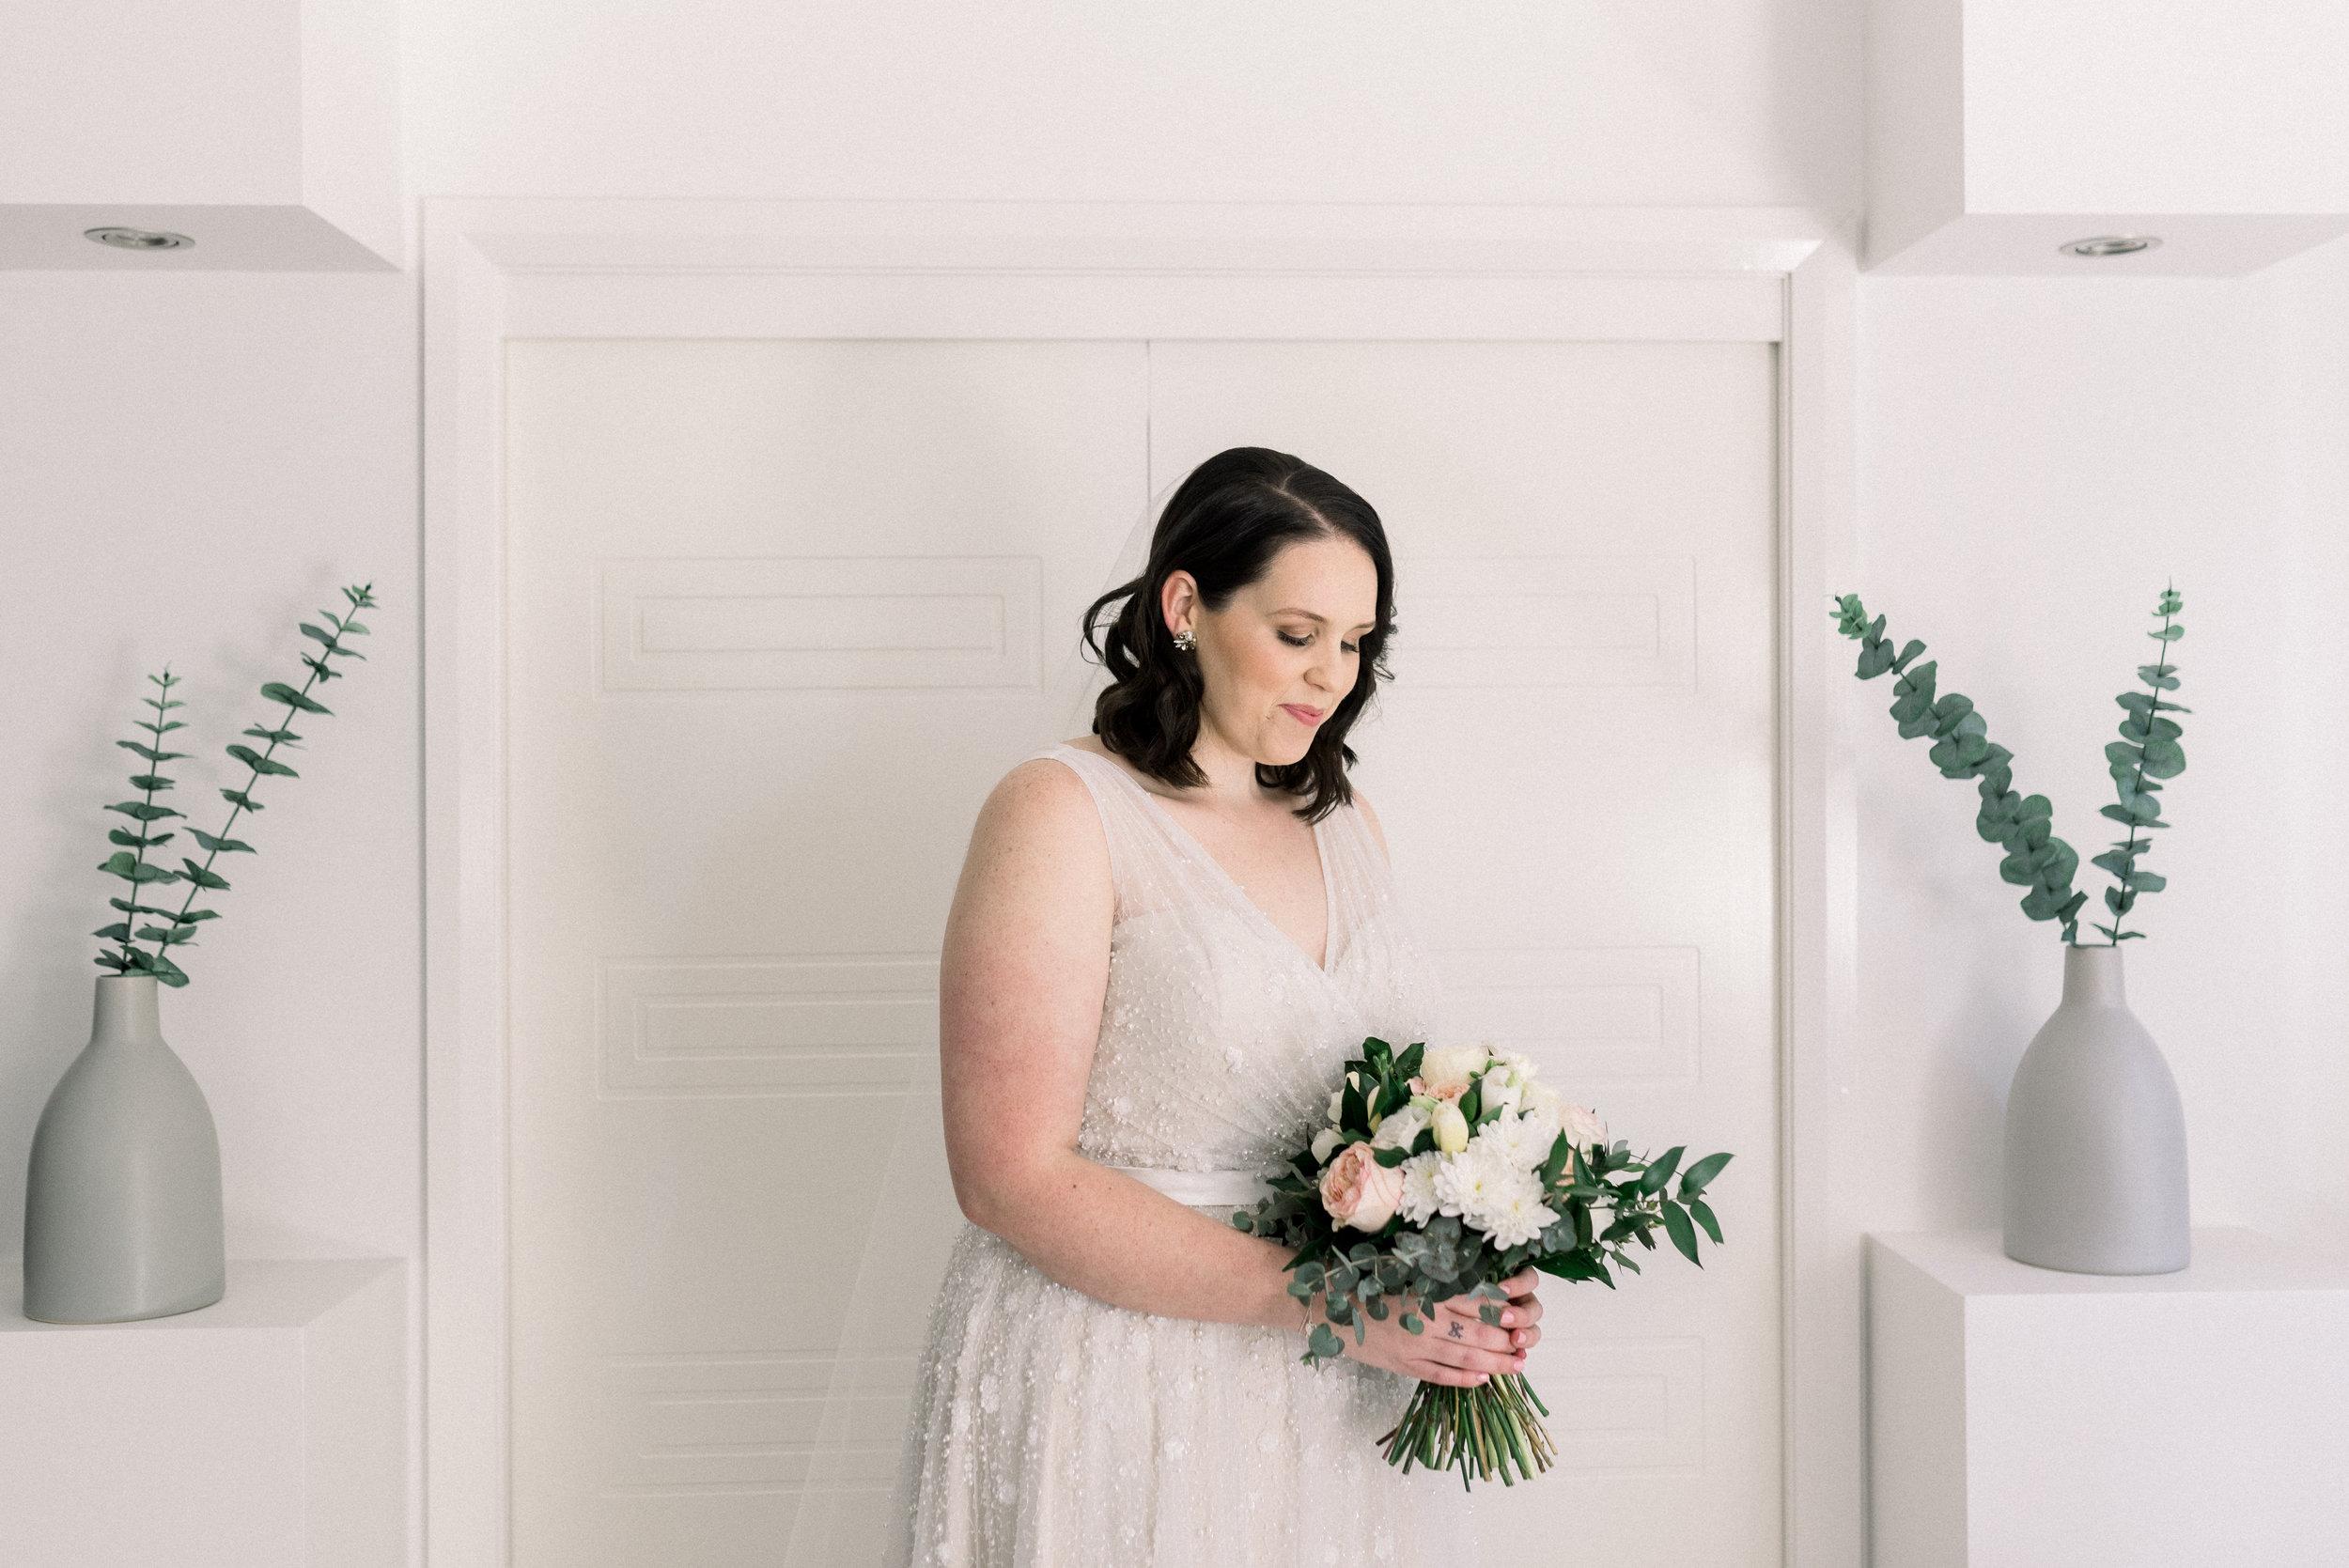 brisbane-city-wedding-photographer-romantic-wedding-14.jpg